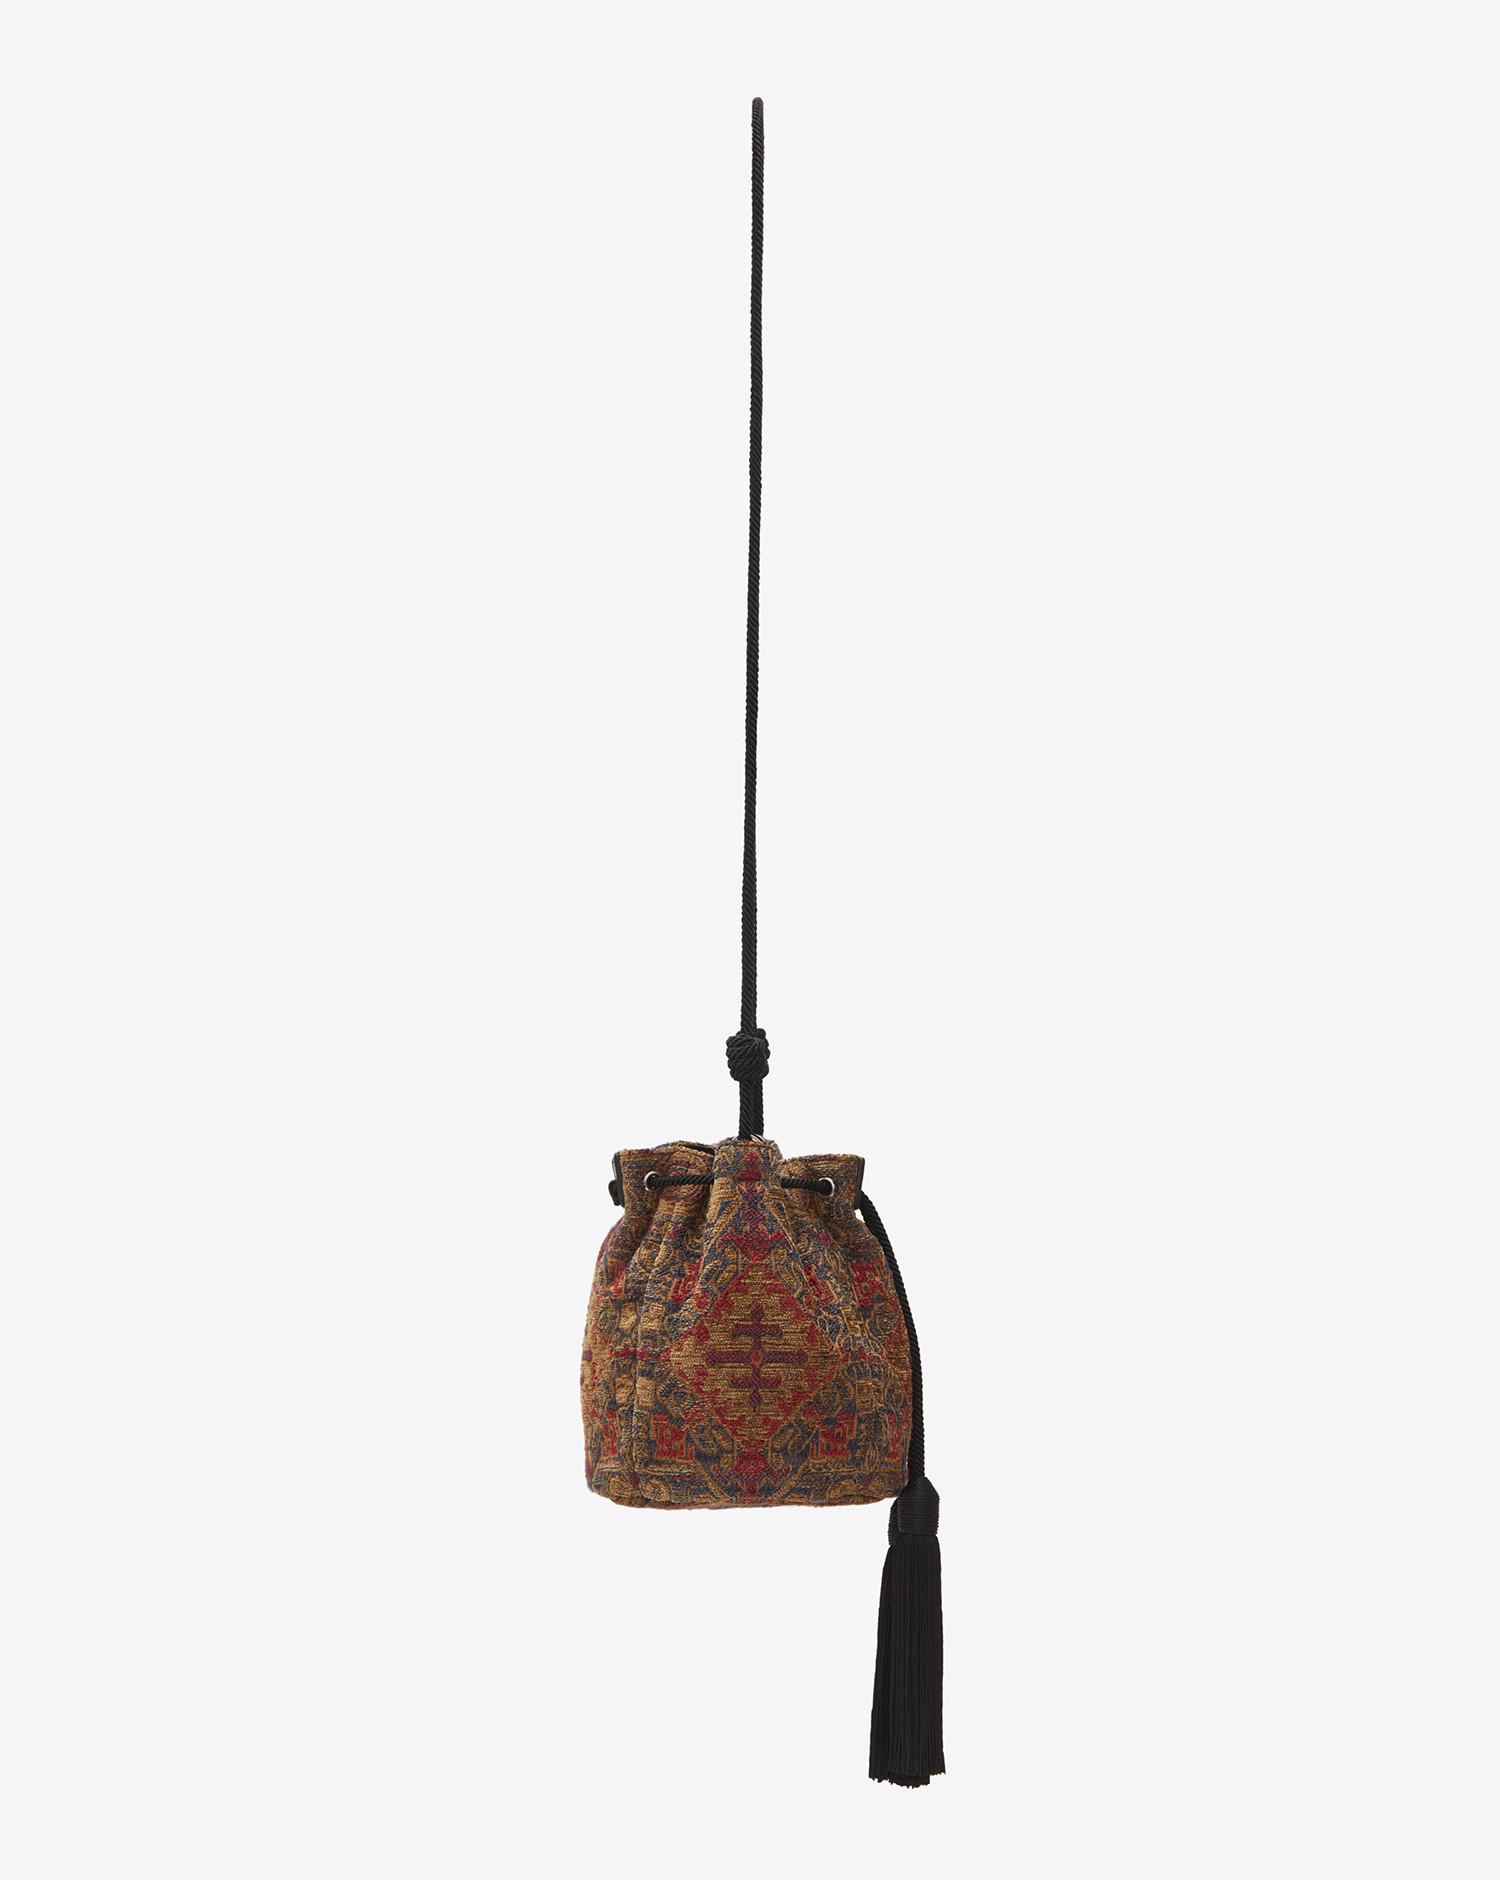 a97e39c24c Saint Laurent Brown Small Anja Tassel Bucket Bag In Saffron Red Marrakech  Woven Fabric